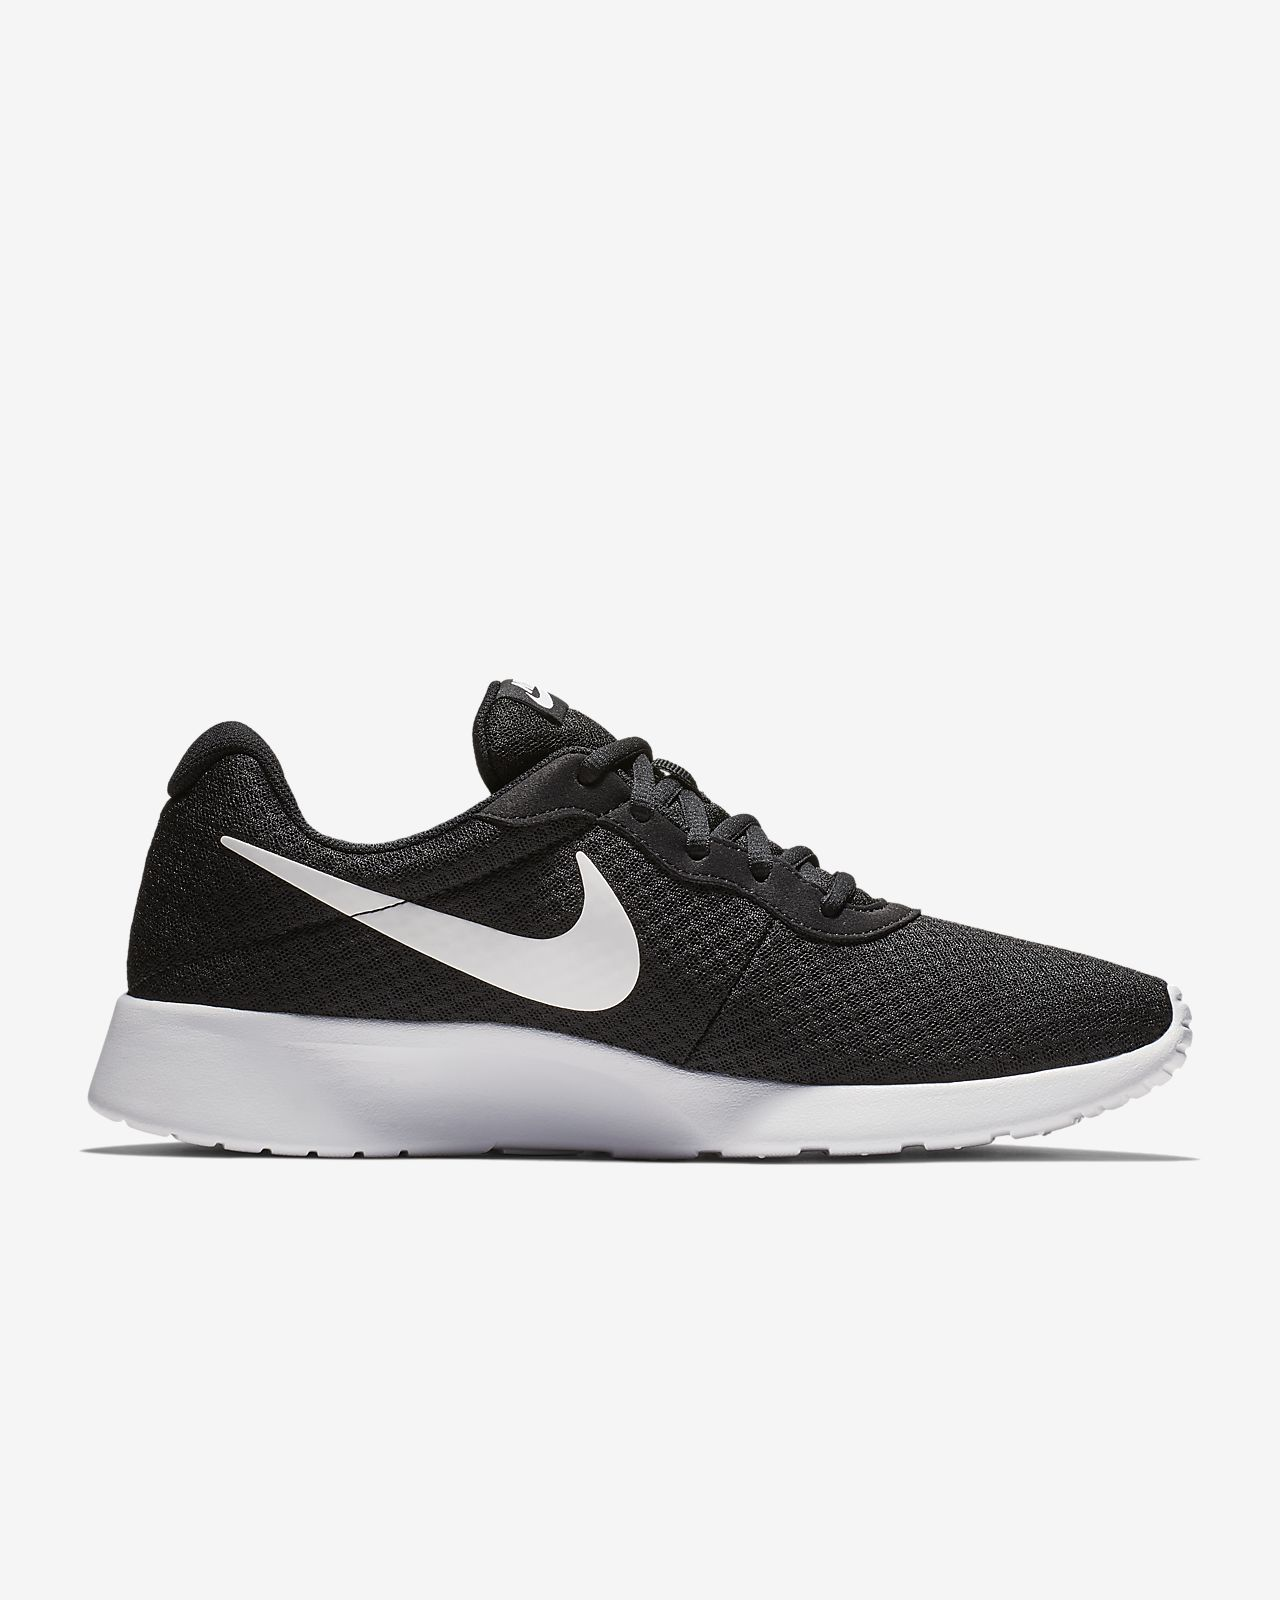 Chaussures Nike Tanjun femme IfvMAra2